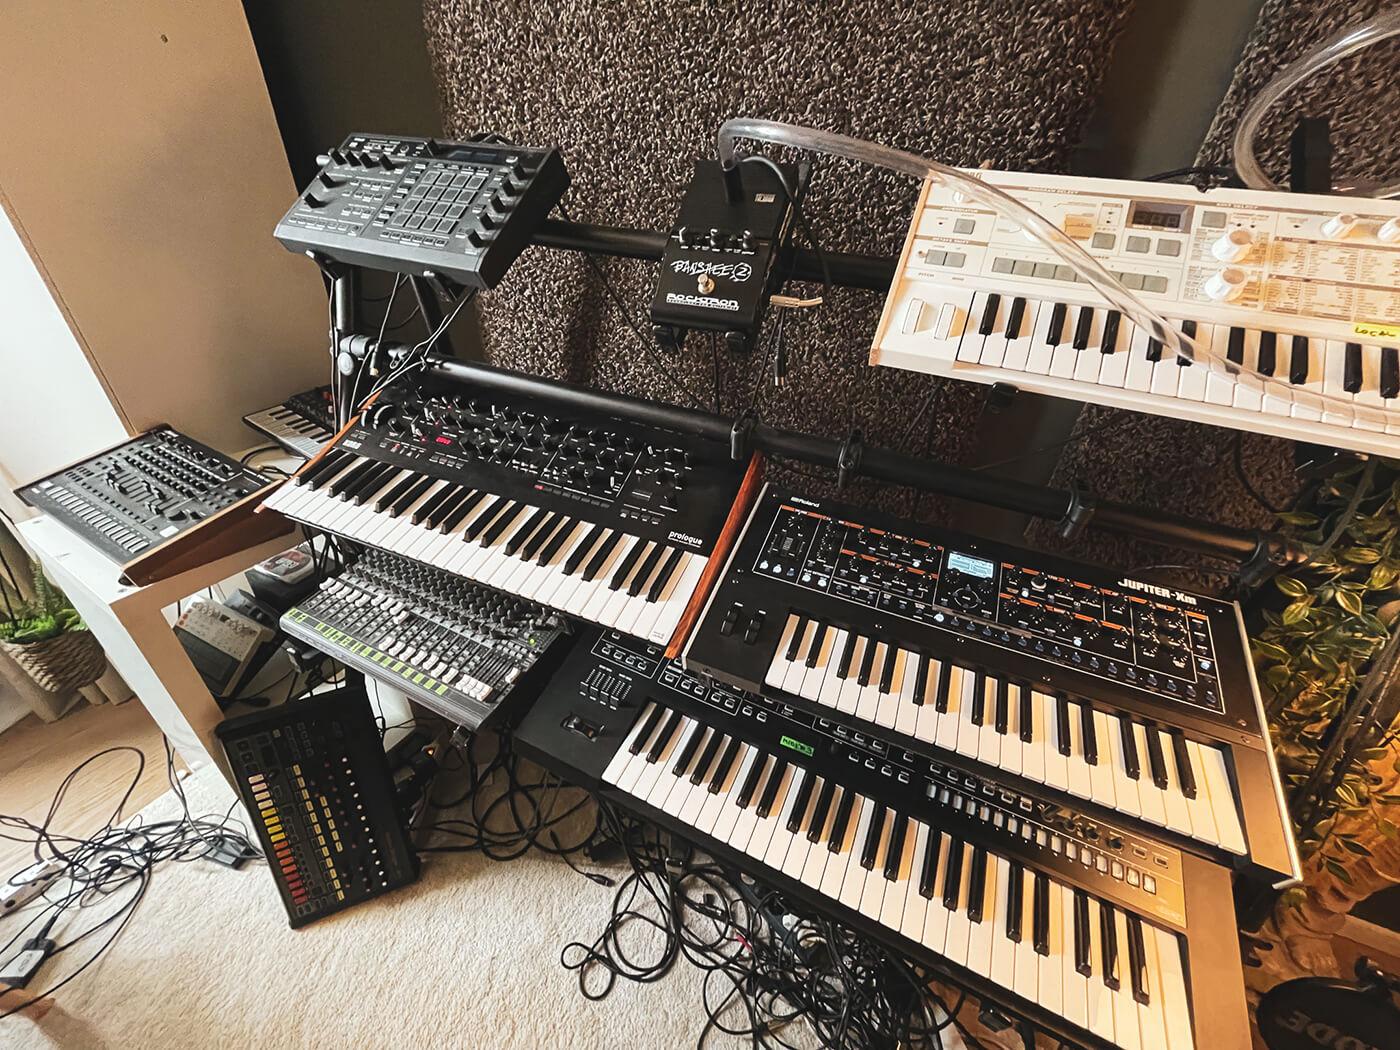 Demuja's Synth Setup